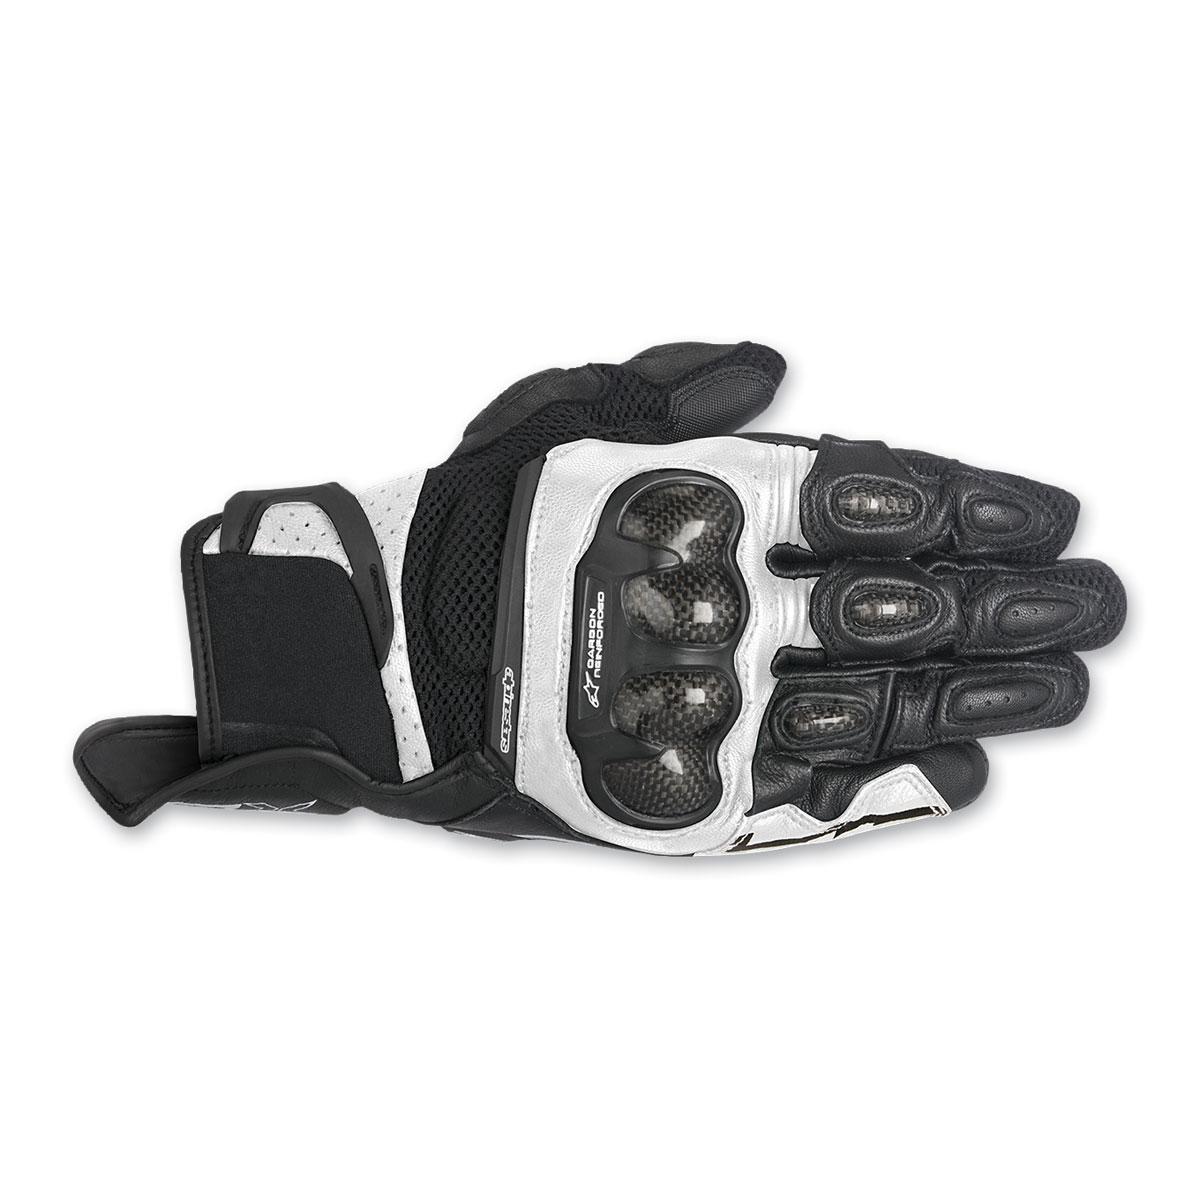 Alpinestars Women's Stella SPX Air Carbon Black/White Gloves